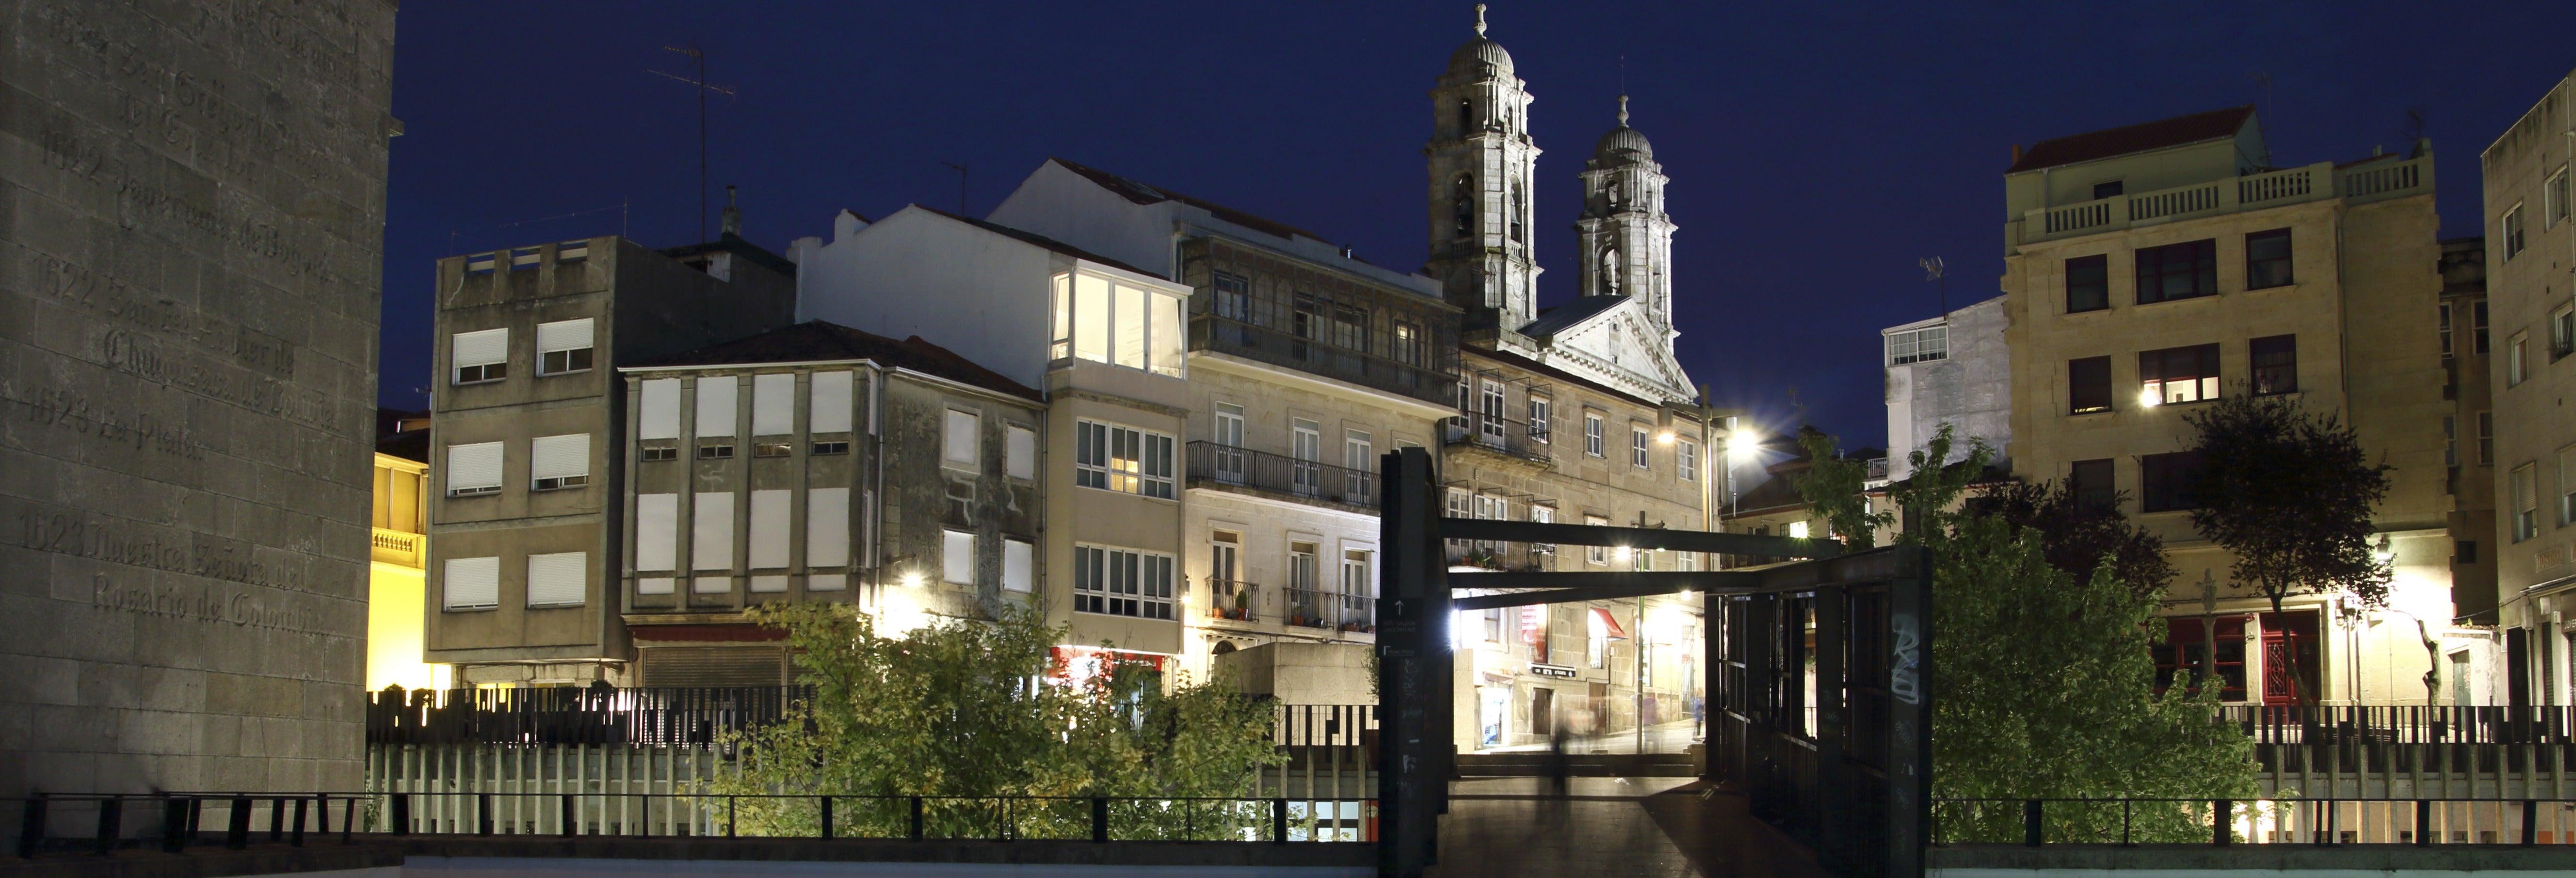 Free tour de misterios y leyendas por Vigo ¡Gratis!